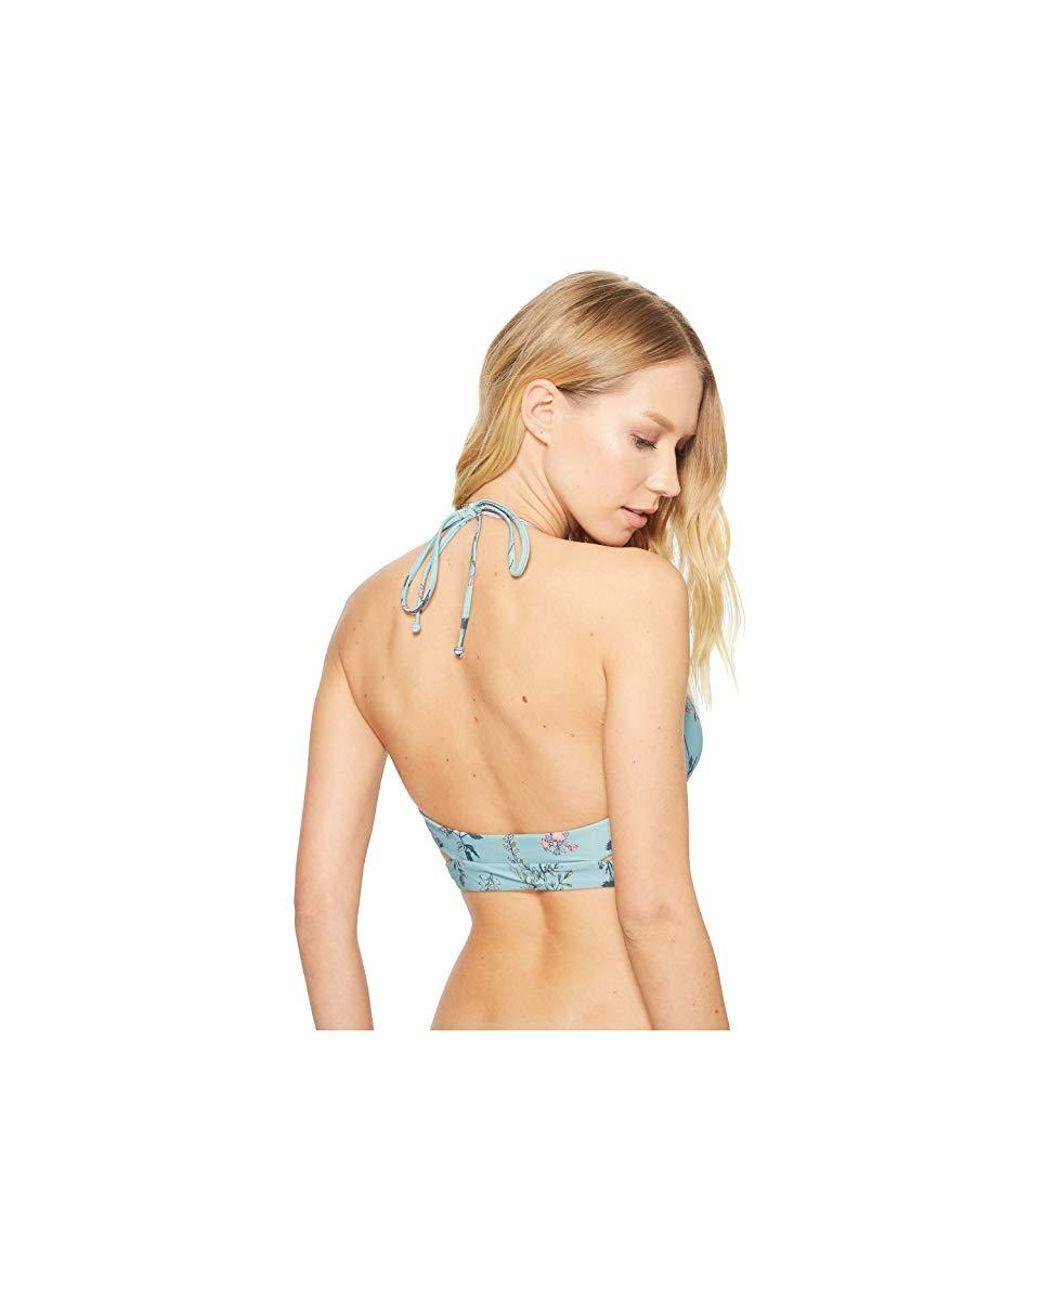 b286324348e O'neill Sportswear Piper Floral Wrap Bikini Top (aqua) Swimwear in Blue -  Lyst